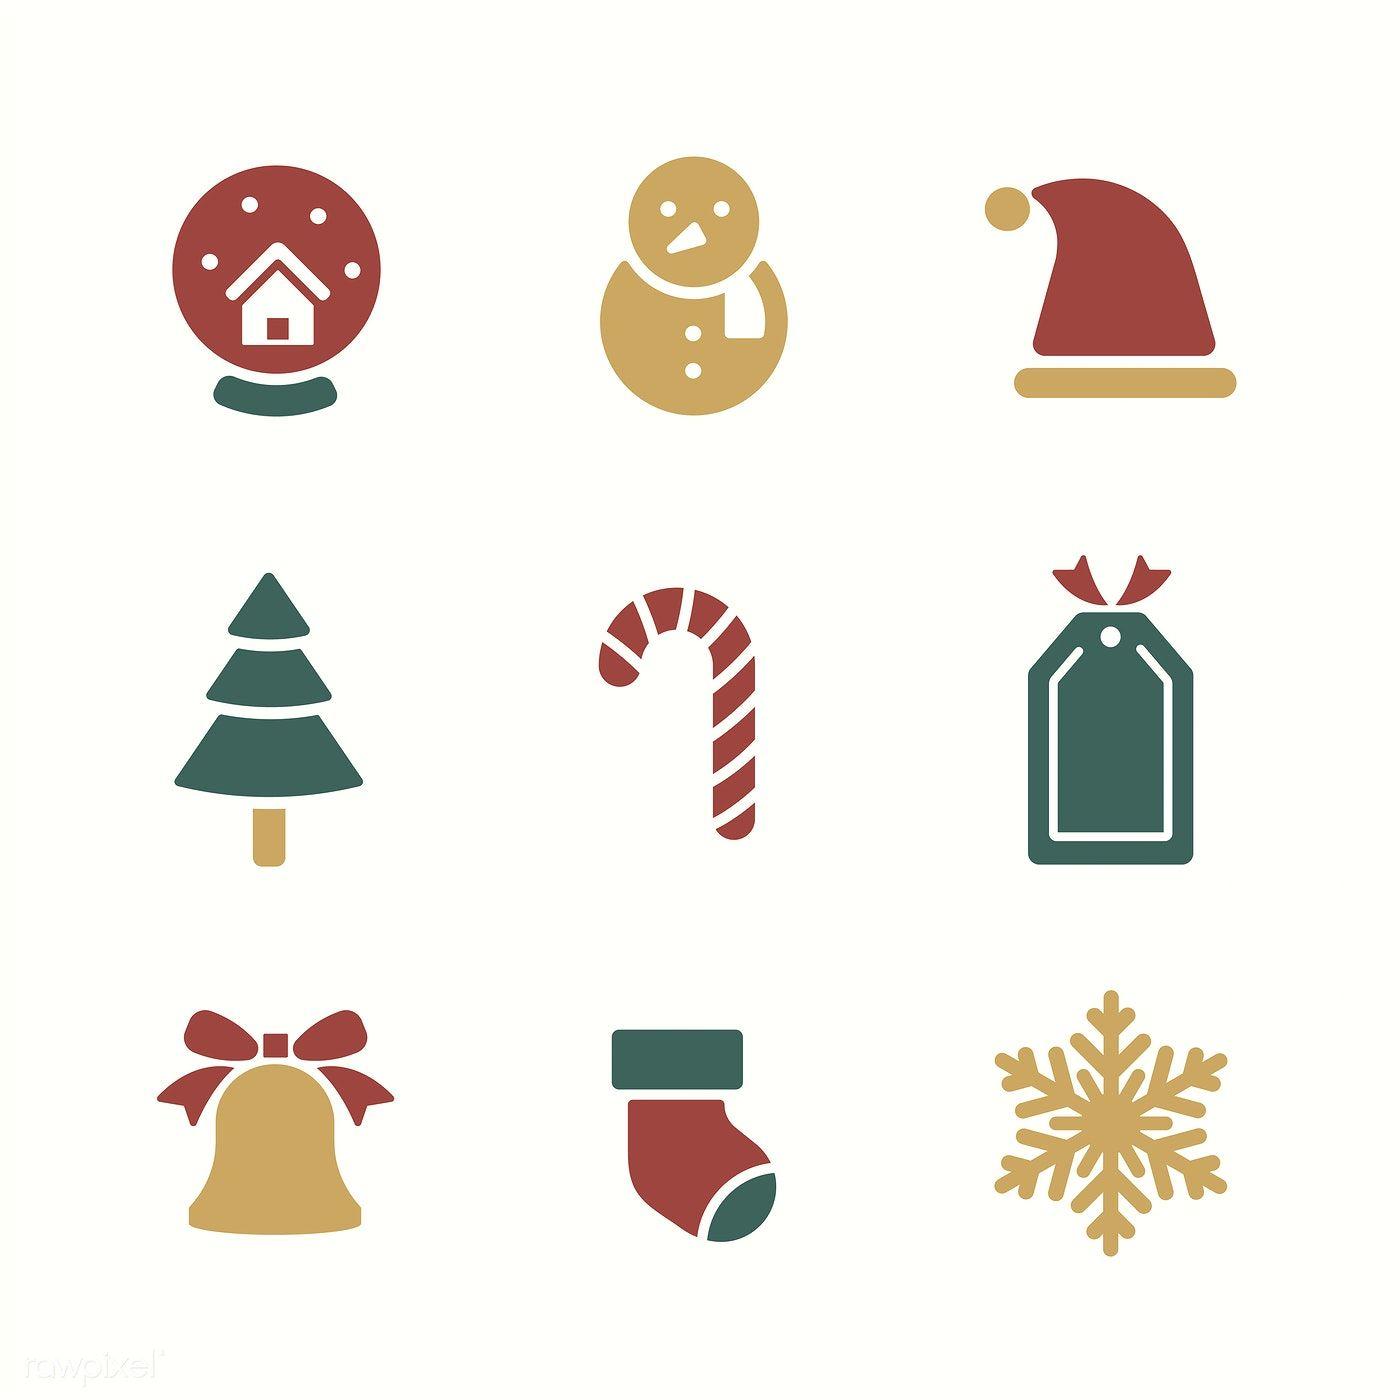 Christmas Holiday Symbols Vector Set Free Image By Rawpixel Com Holiday Symbols Christmas Icons Christmas Drawing